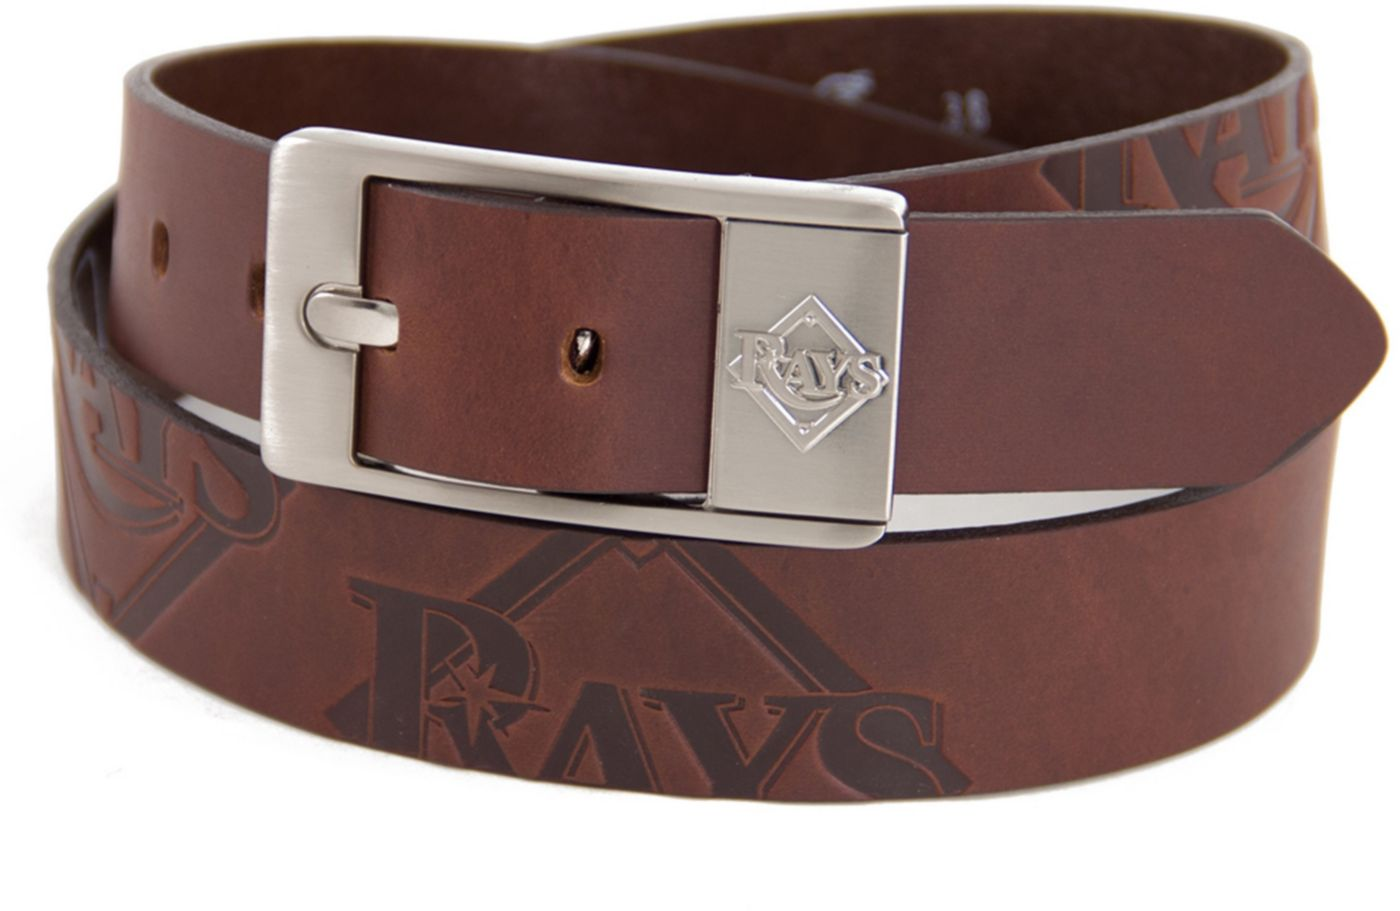 Eagles Wings Tampa Bay Rays Brandish Belt